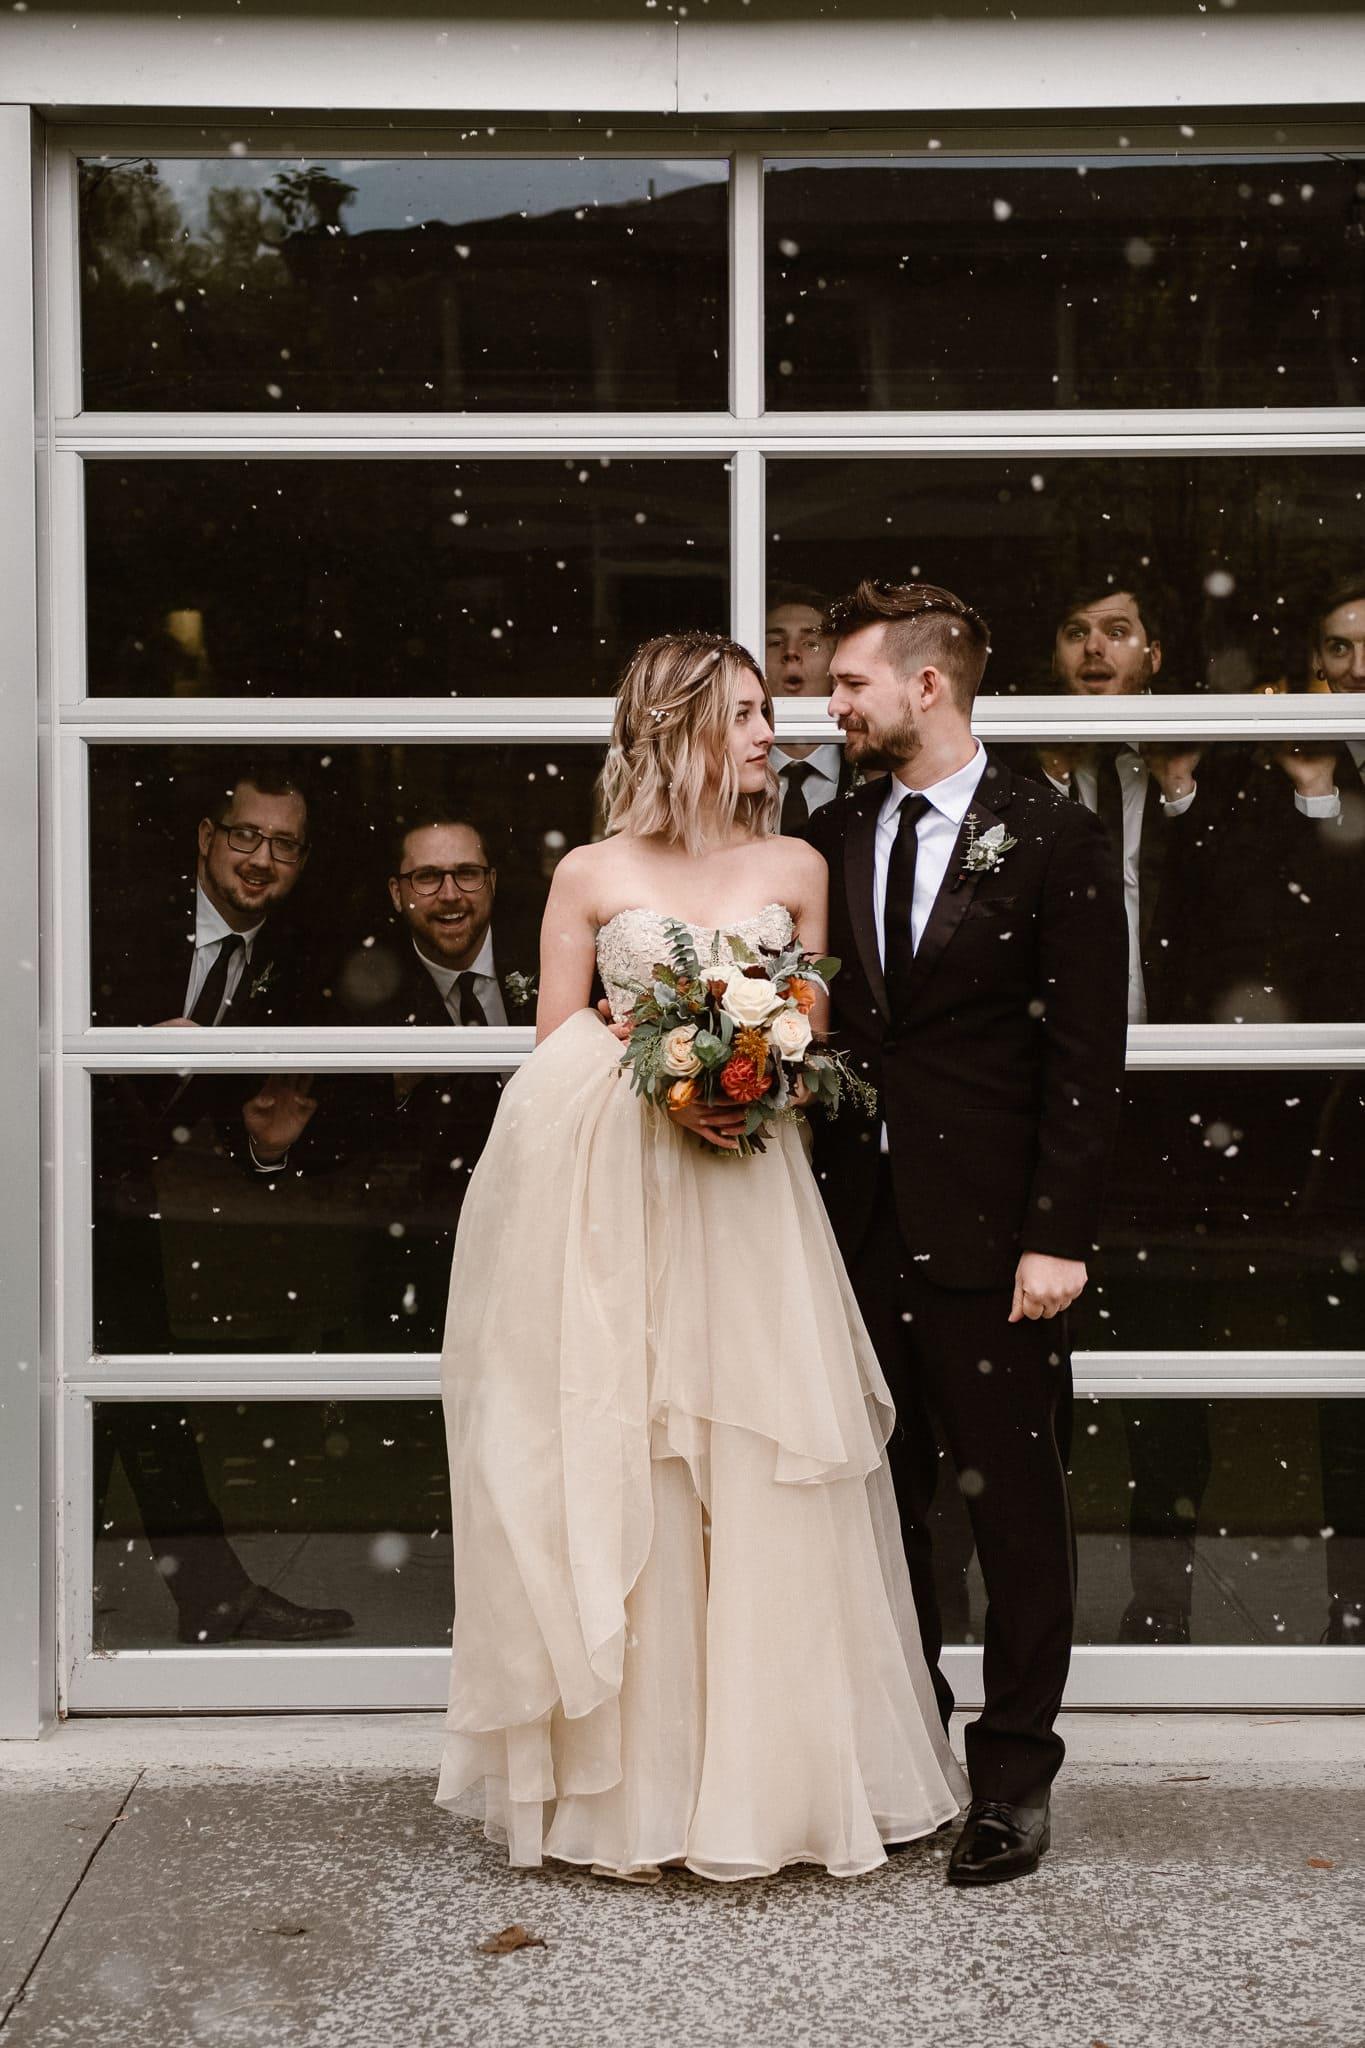 St Vrain Wedding Photographer | Longmont Wedding Photographer | Colorado Winter Wedding Photographer, Colorado industrial chic wedding, bride and groom portraits, silly groomsmen